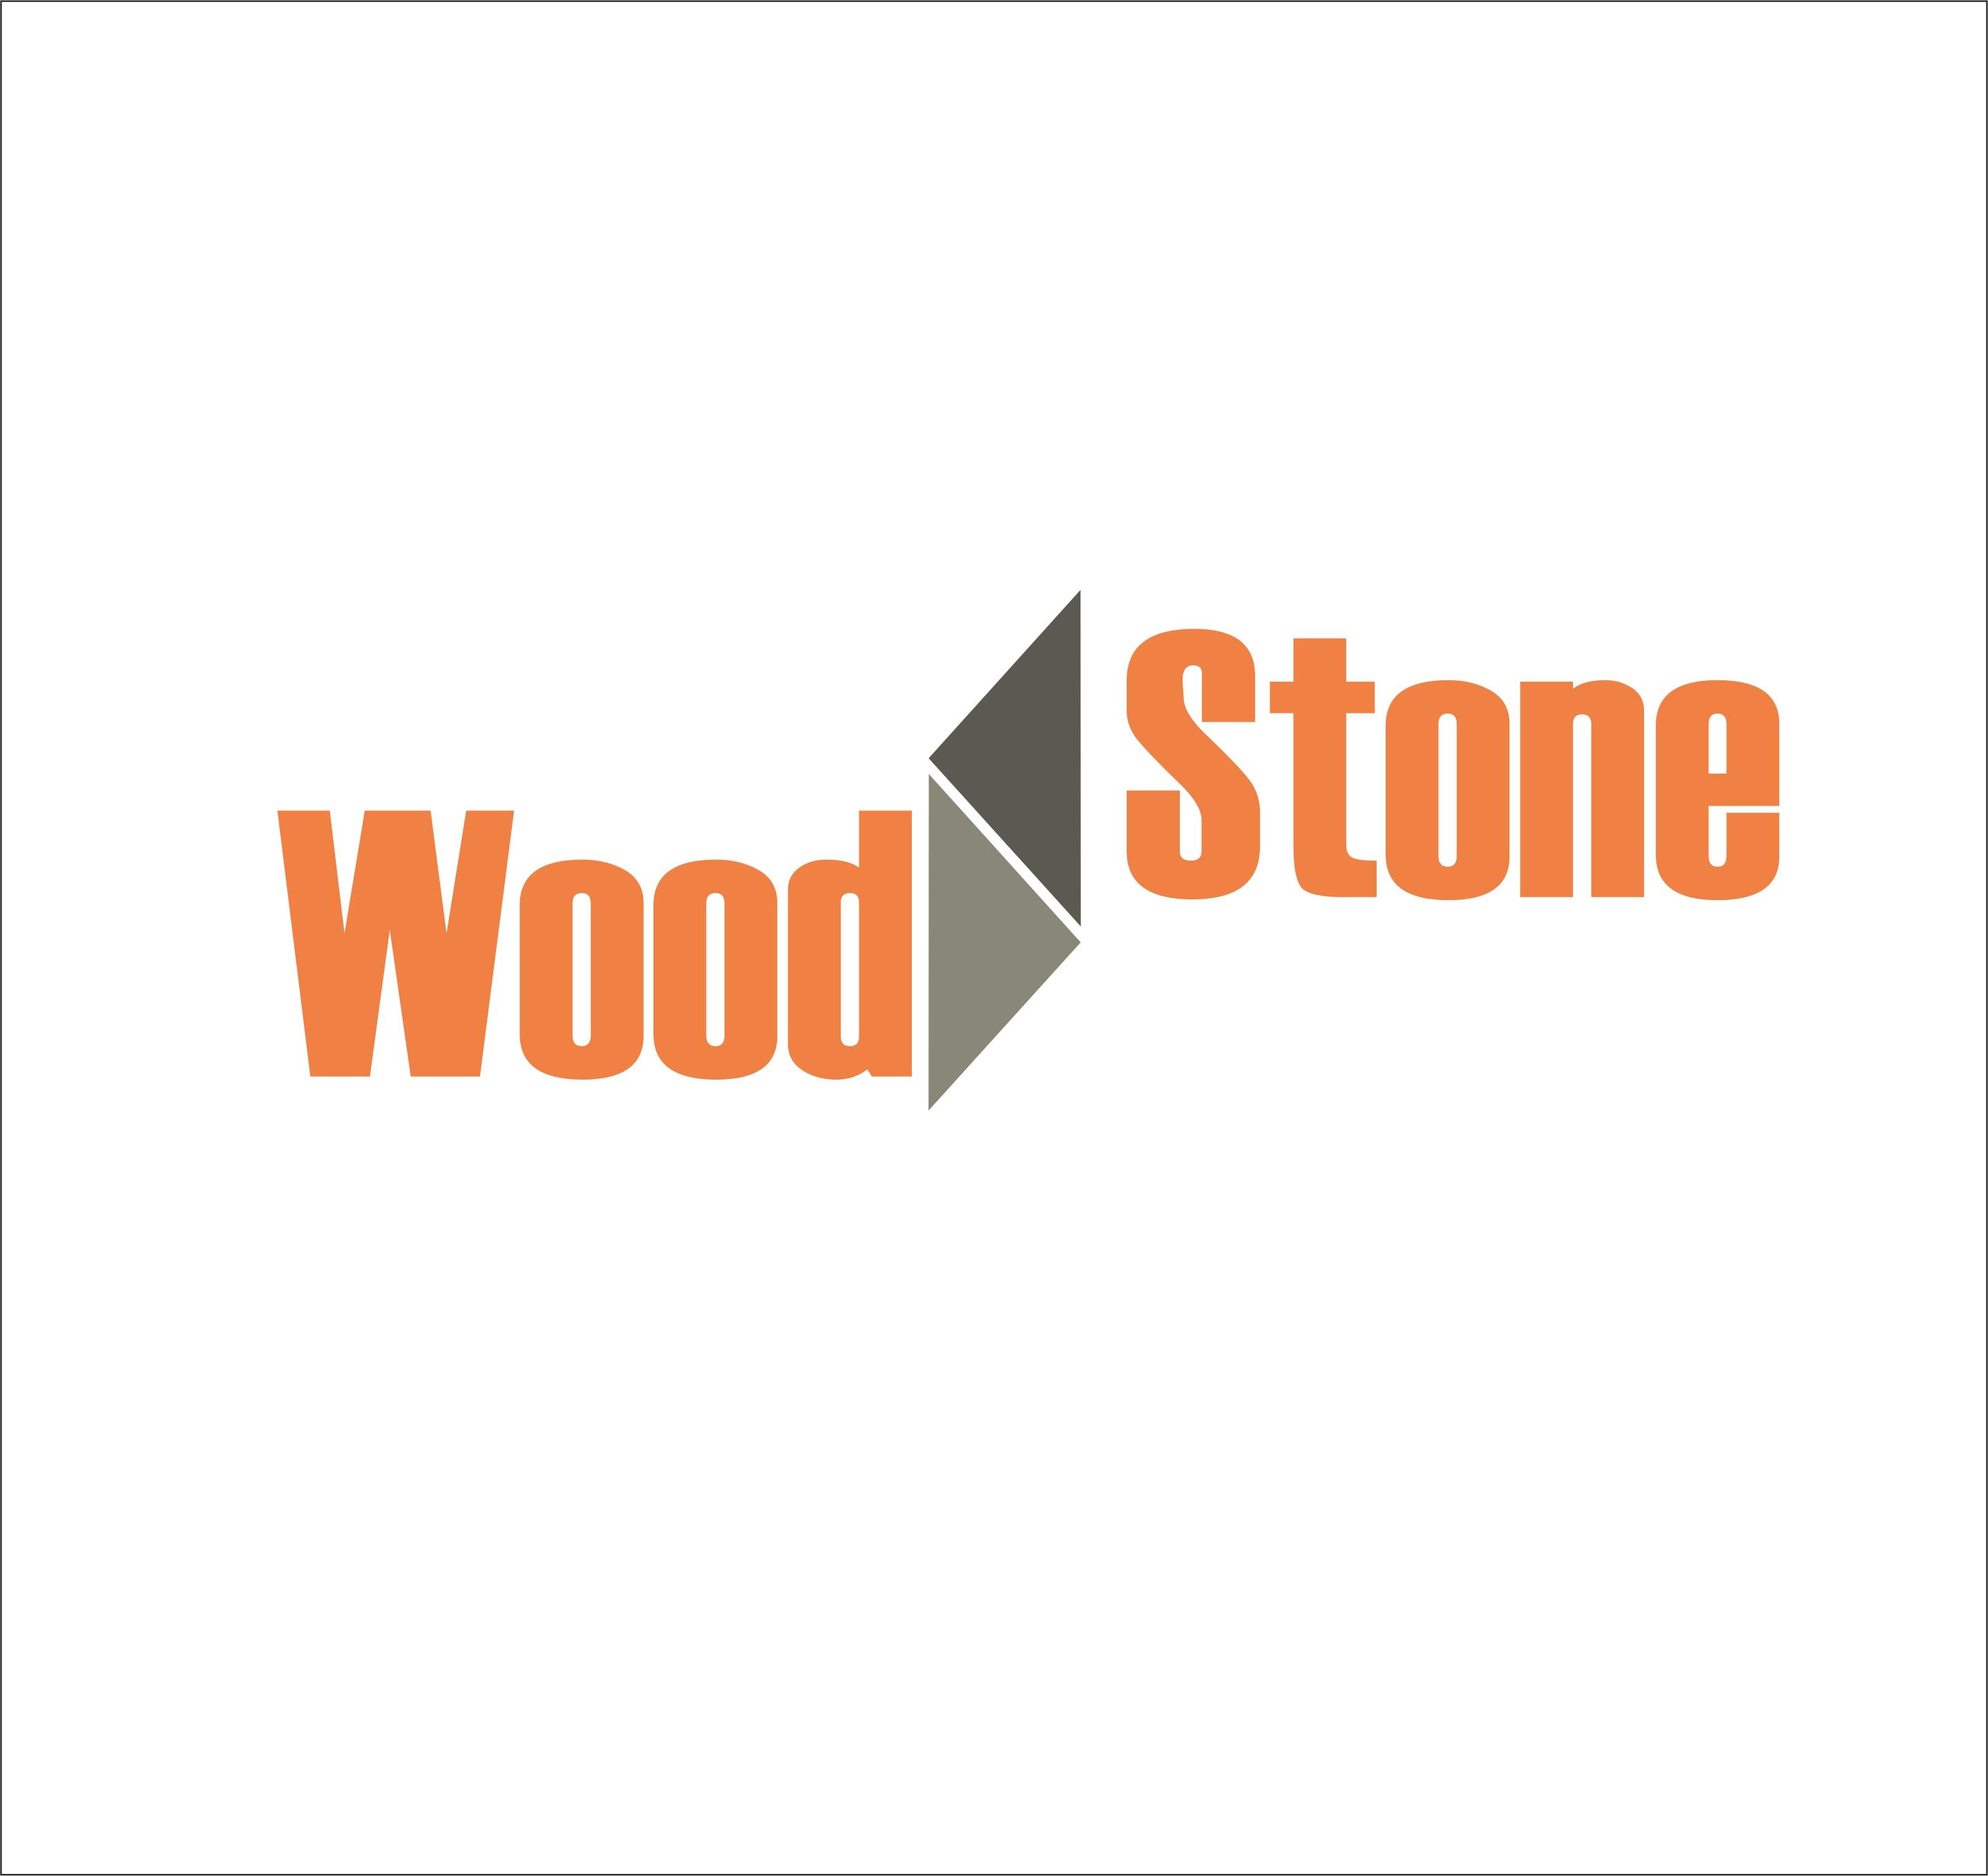 Логотип и Фирменный стиль фото f_5705497d584174ab.jpg